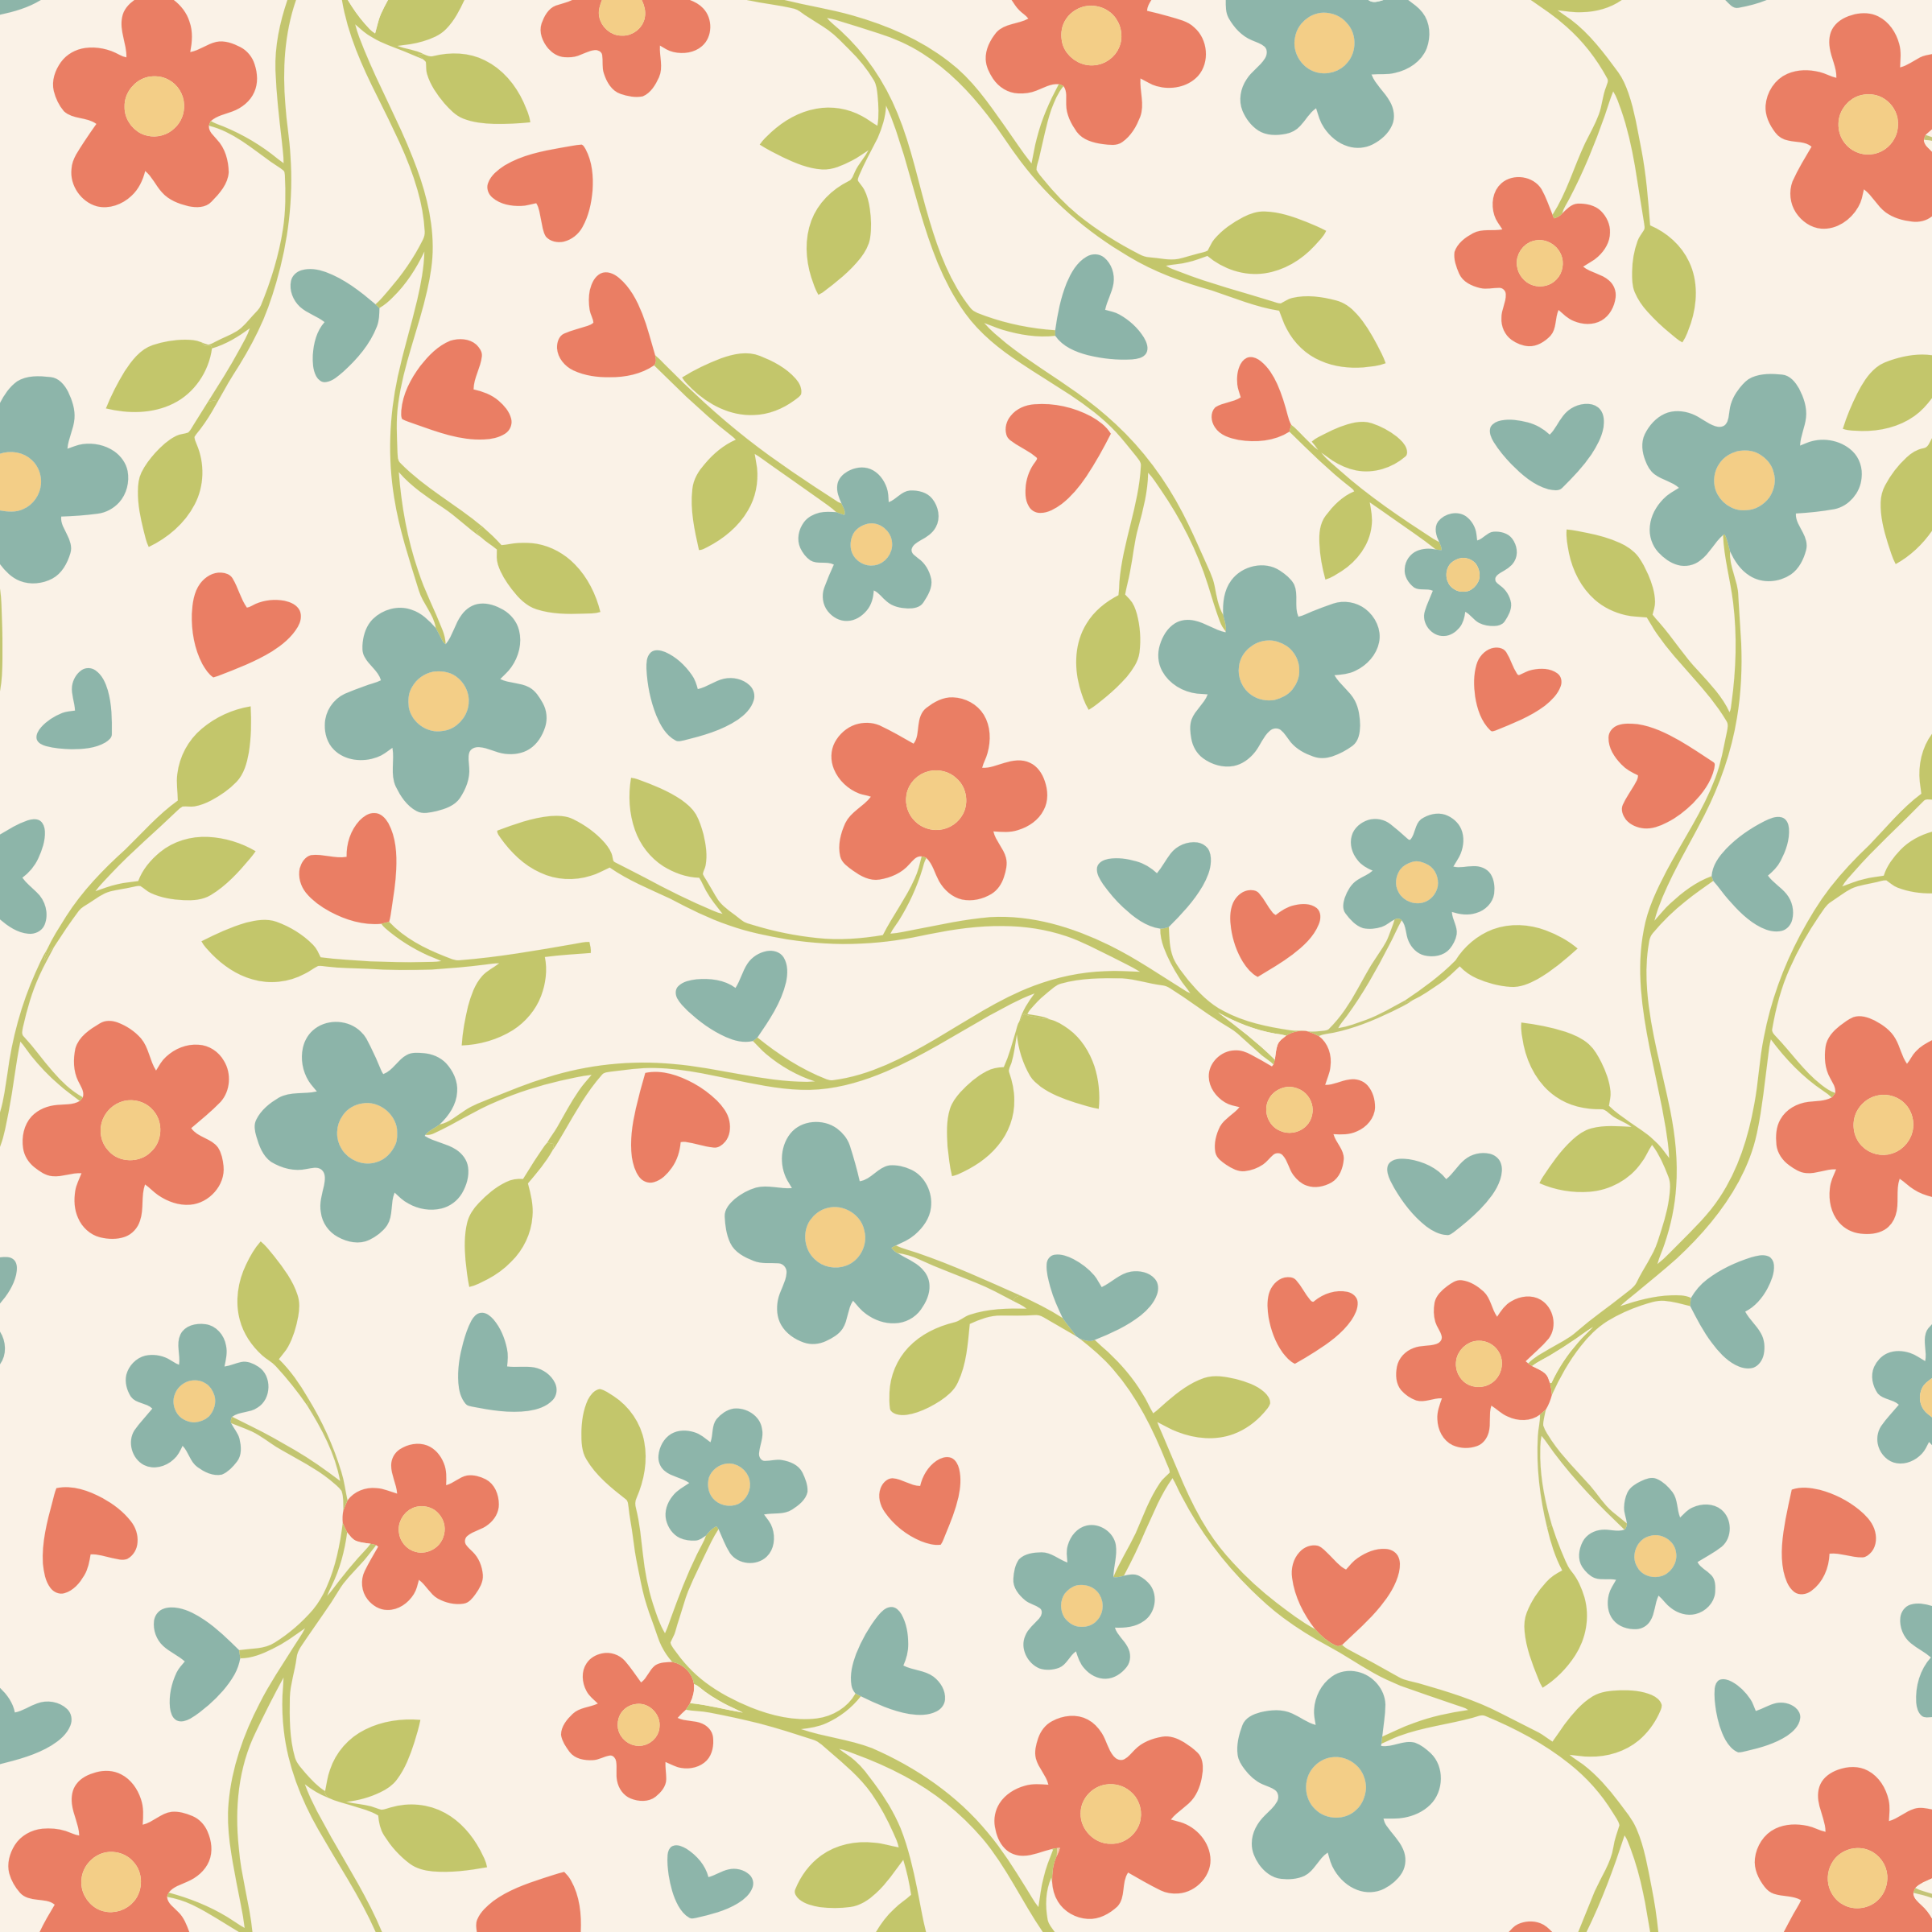 Floral Pattern Background Best Wallpaper 16333 - Baltana